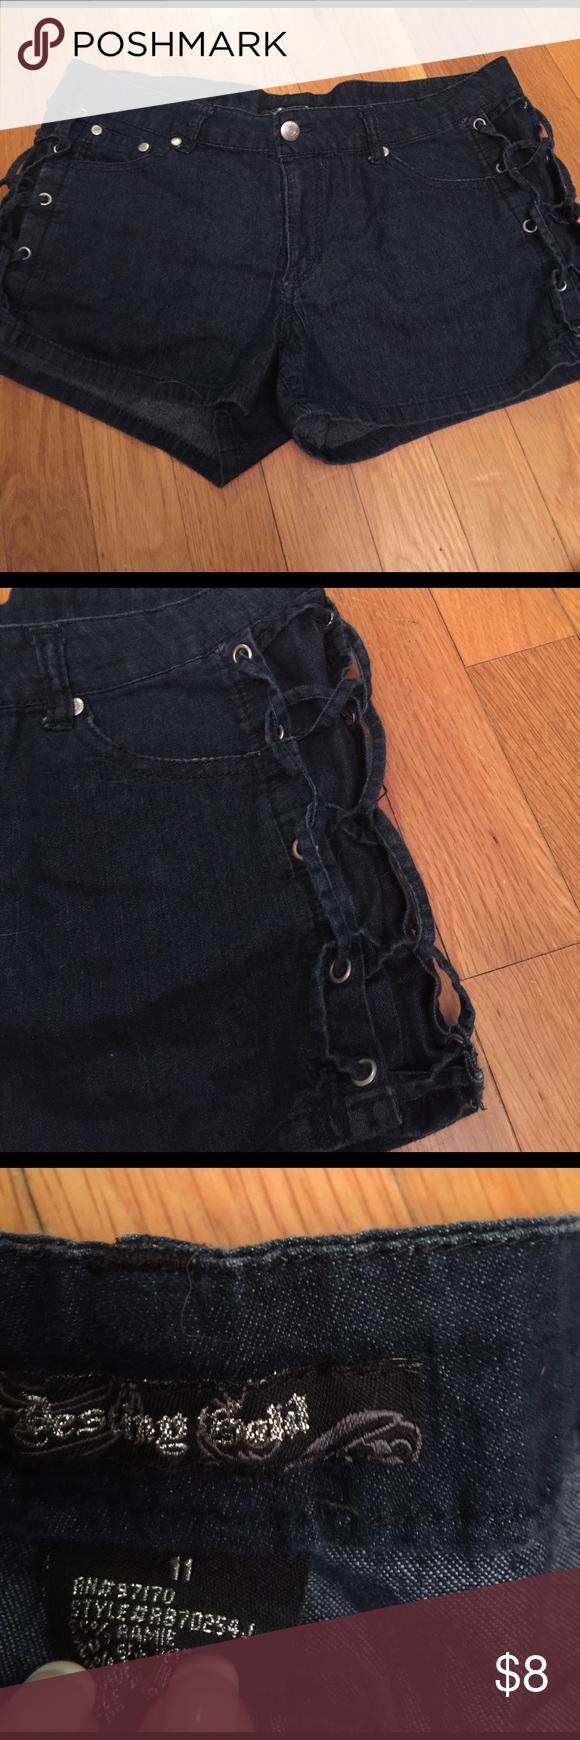 jean shorts Adorable jean shorts size 11 juniors Shorts Jean Shorts